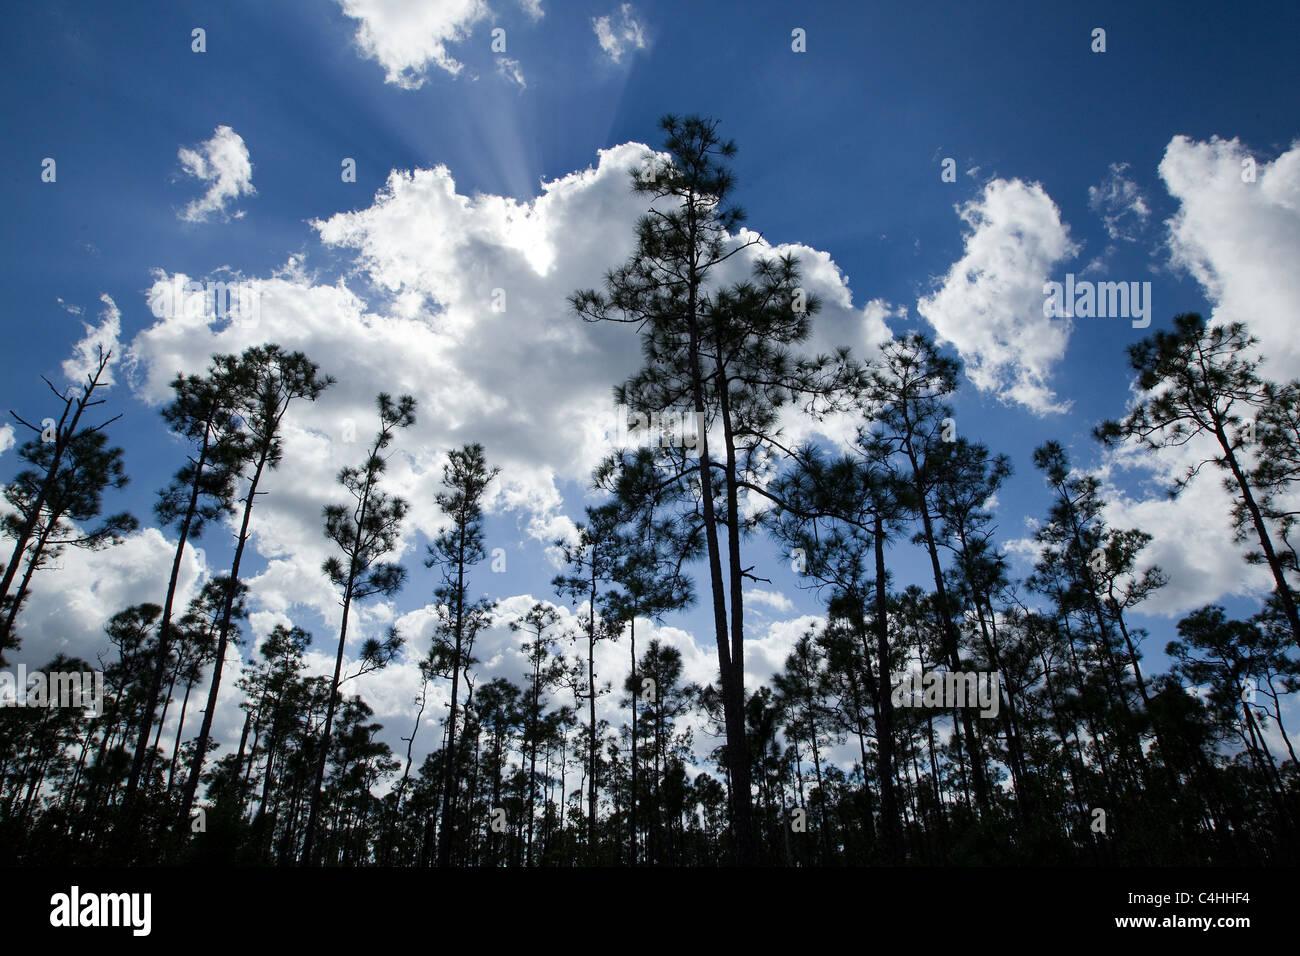 Slash pines and cumulus clouds, Pinus elliottii, Pinelands, Everglades National Park, Florida, USA - Stock Image